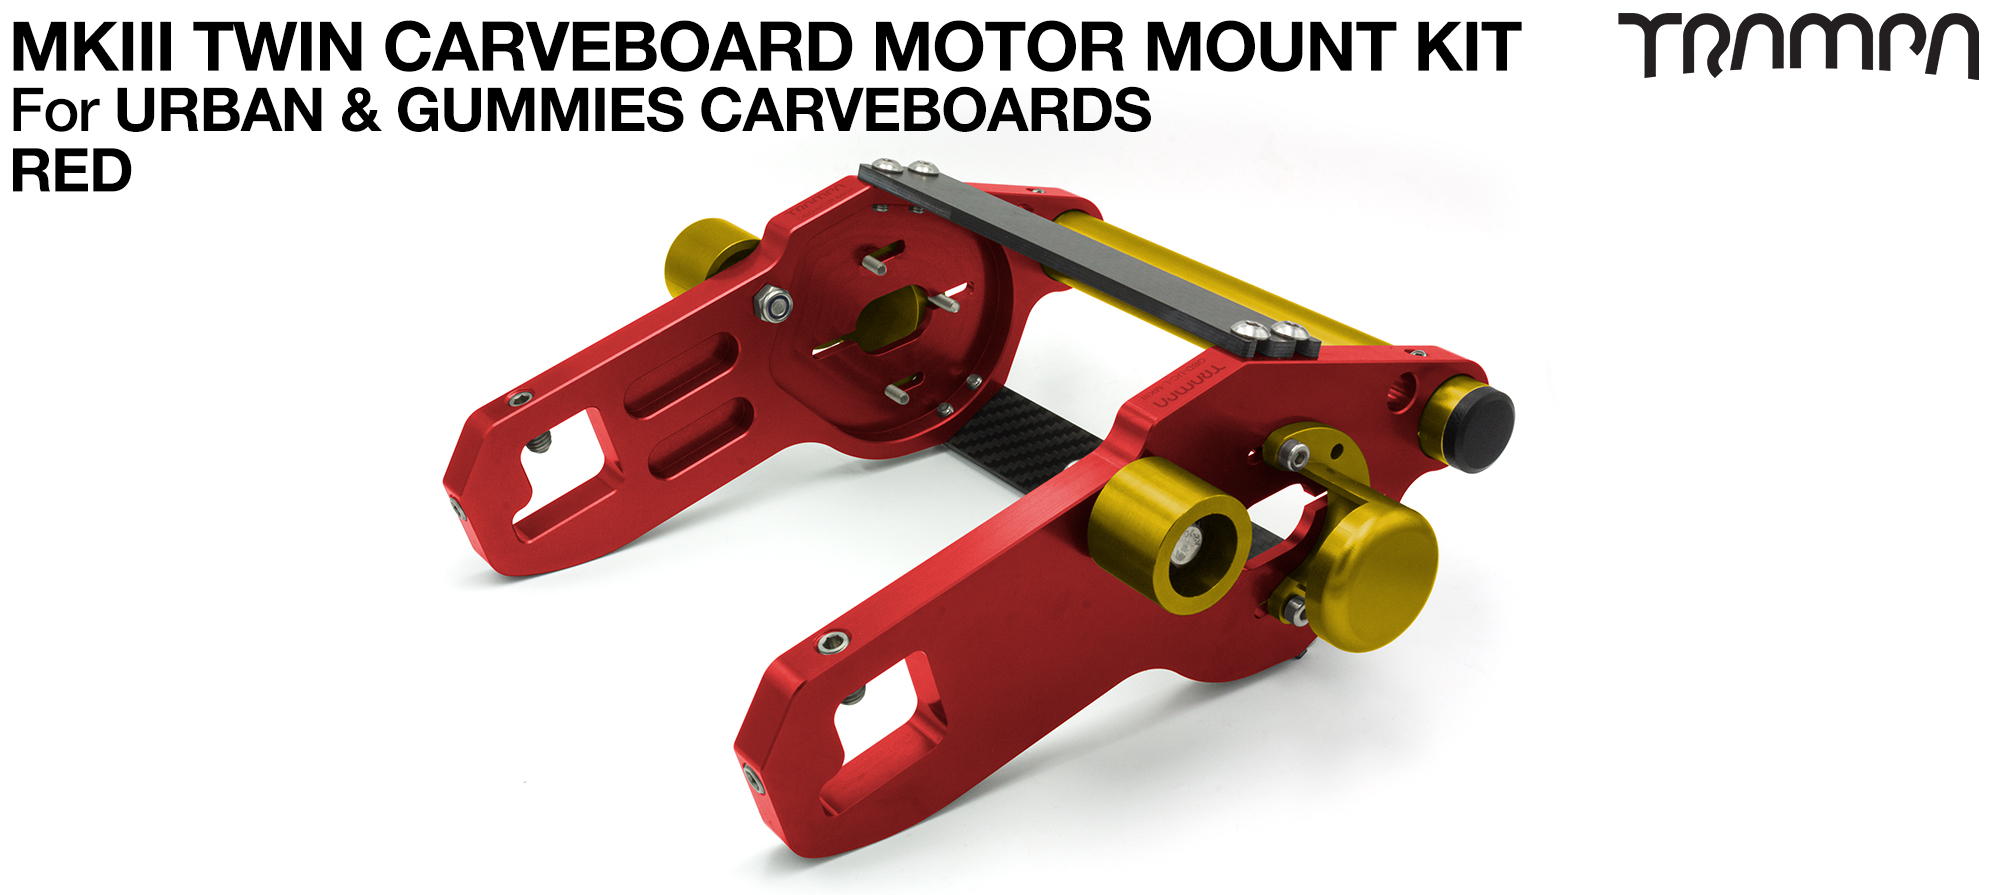 MkIII CARVE BOARD Motor Mount Kit - TWIN RED